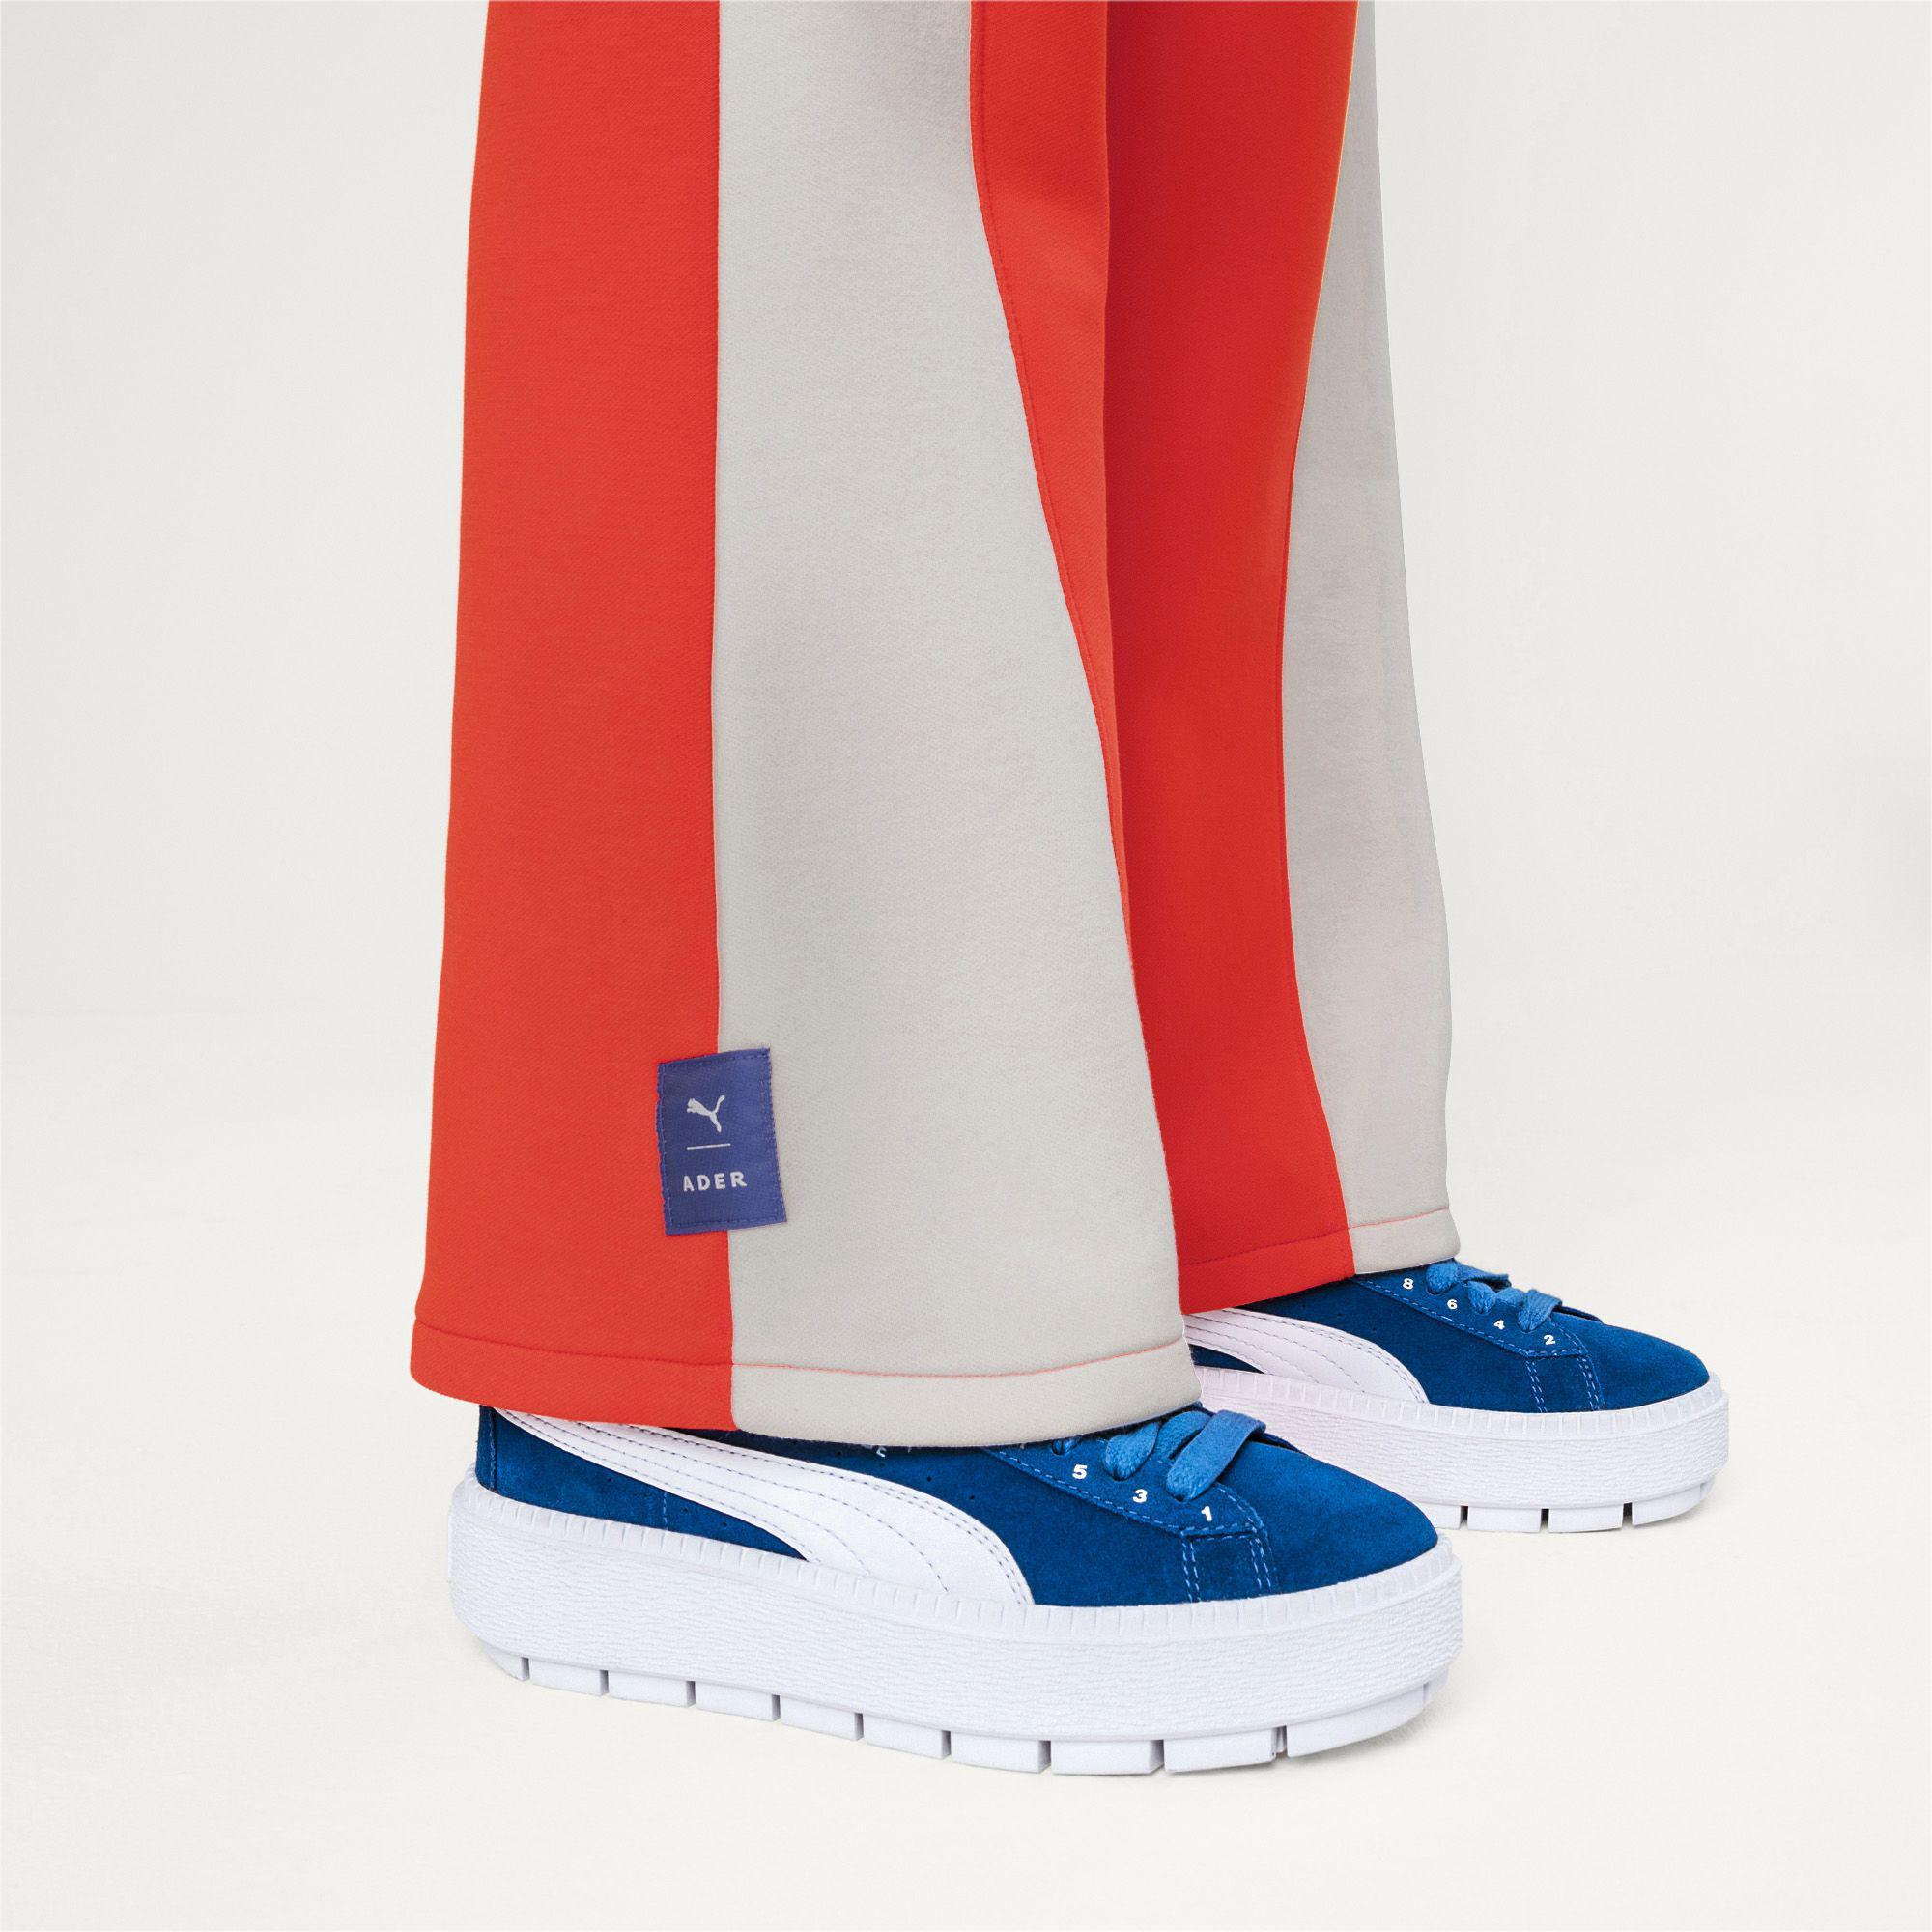 Lyst - PUMA X Ader Error Platform Trace Women s Sneakers in Blue 732946c21